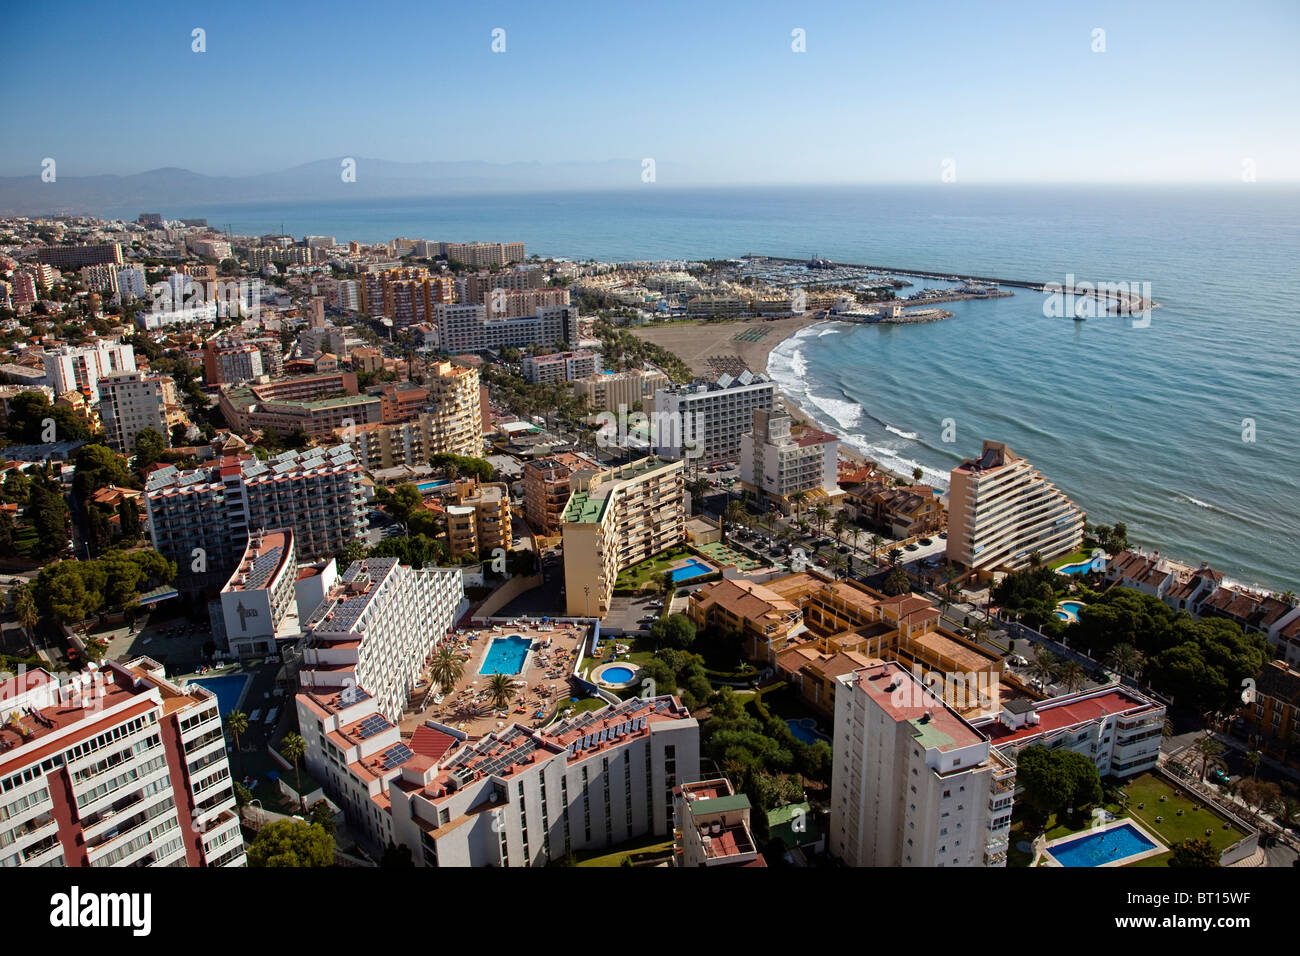 Vista aerea de benalm dena m laga costa del sol andaluc a espa a stock photo 31988699 alamy - Fotografia aerea malaga ...